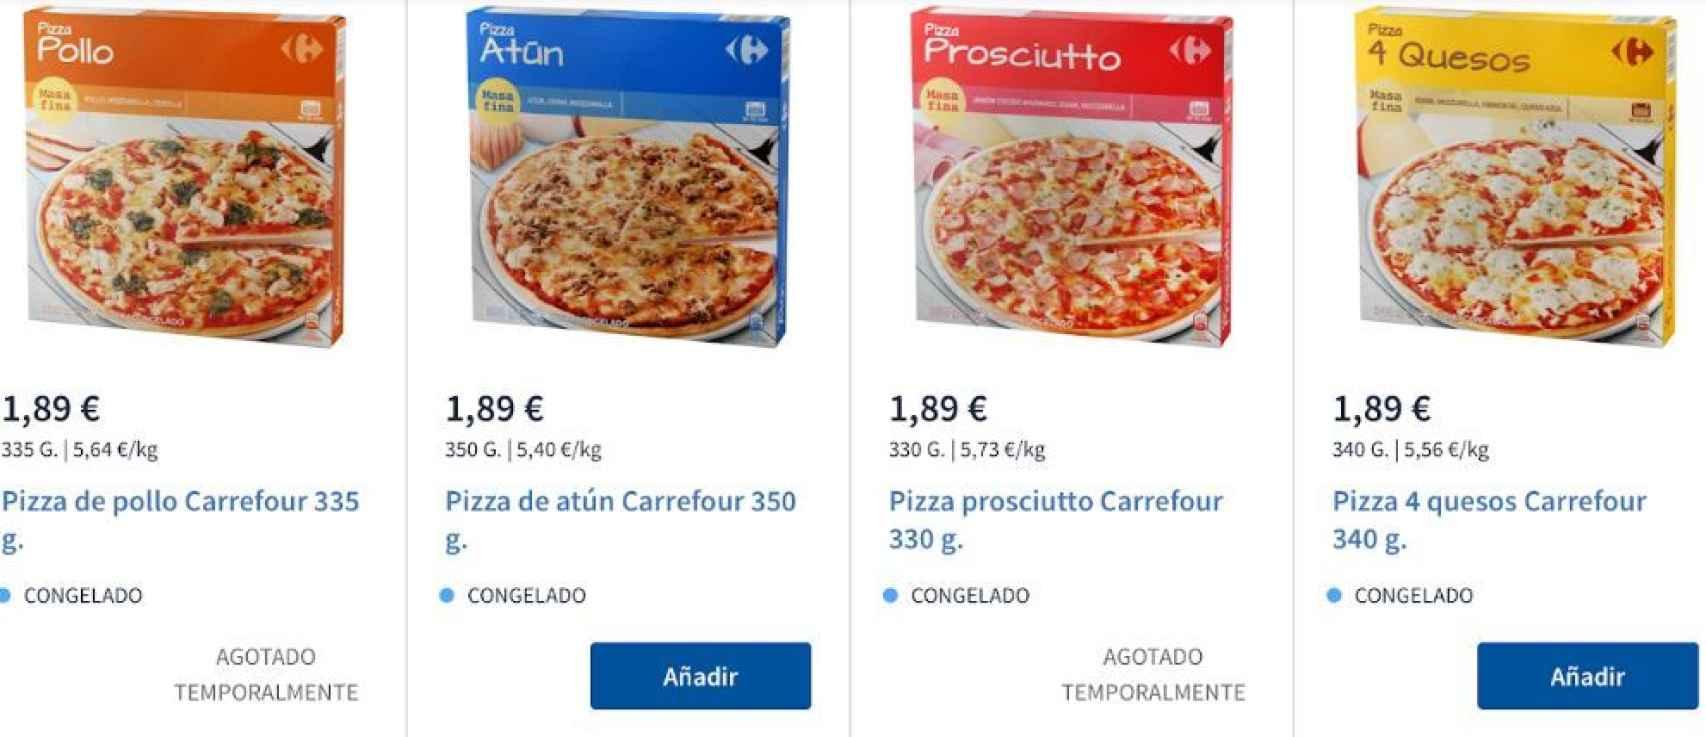 Pizzas, agotadas en Carrefour.